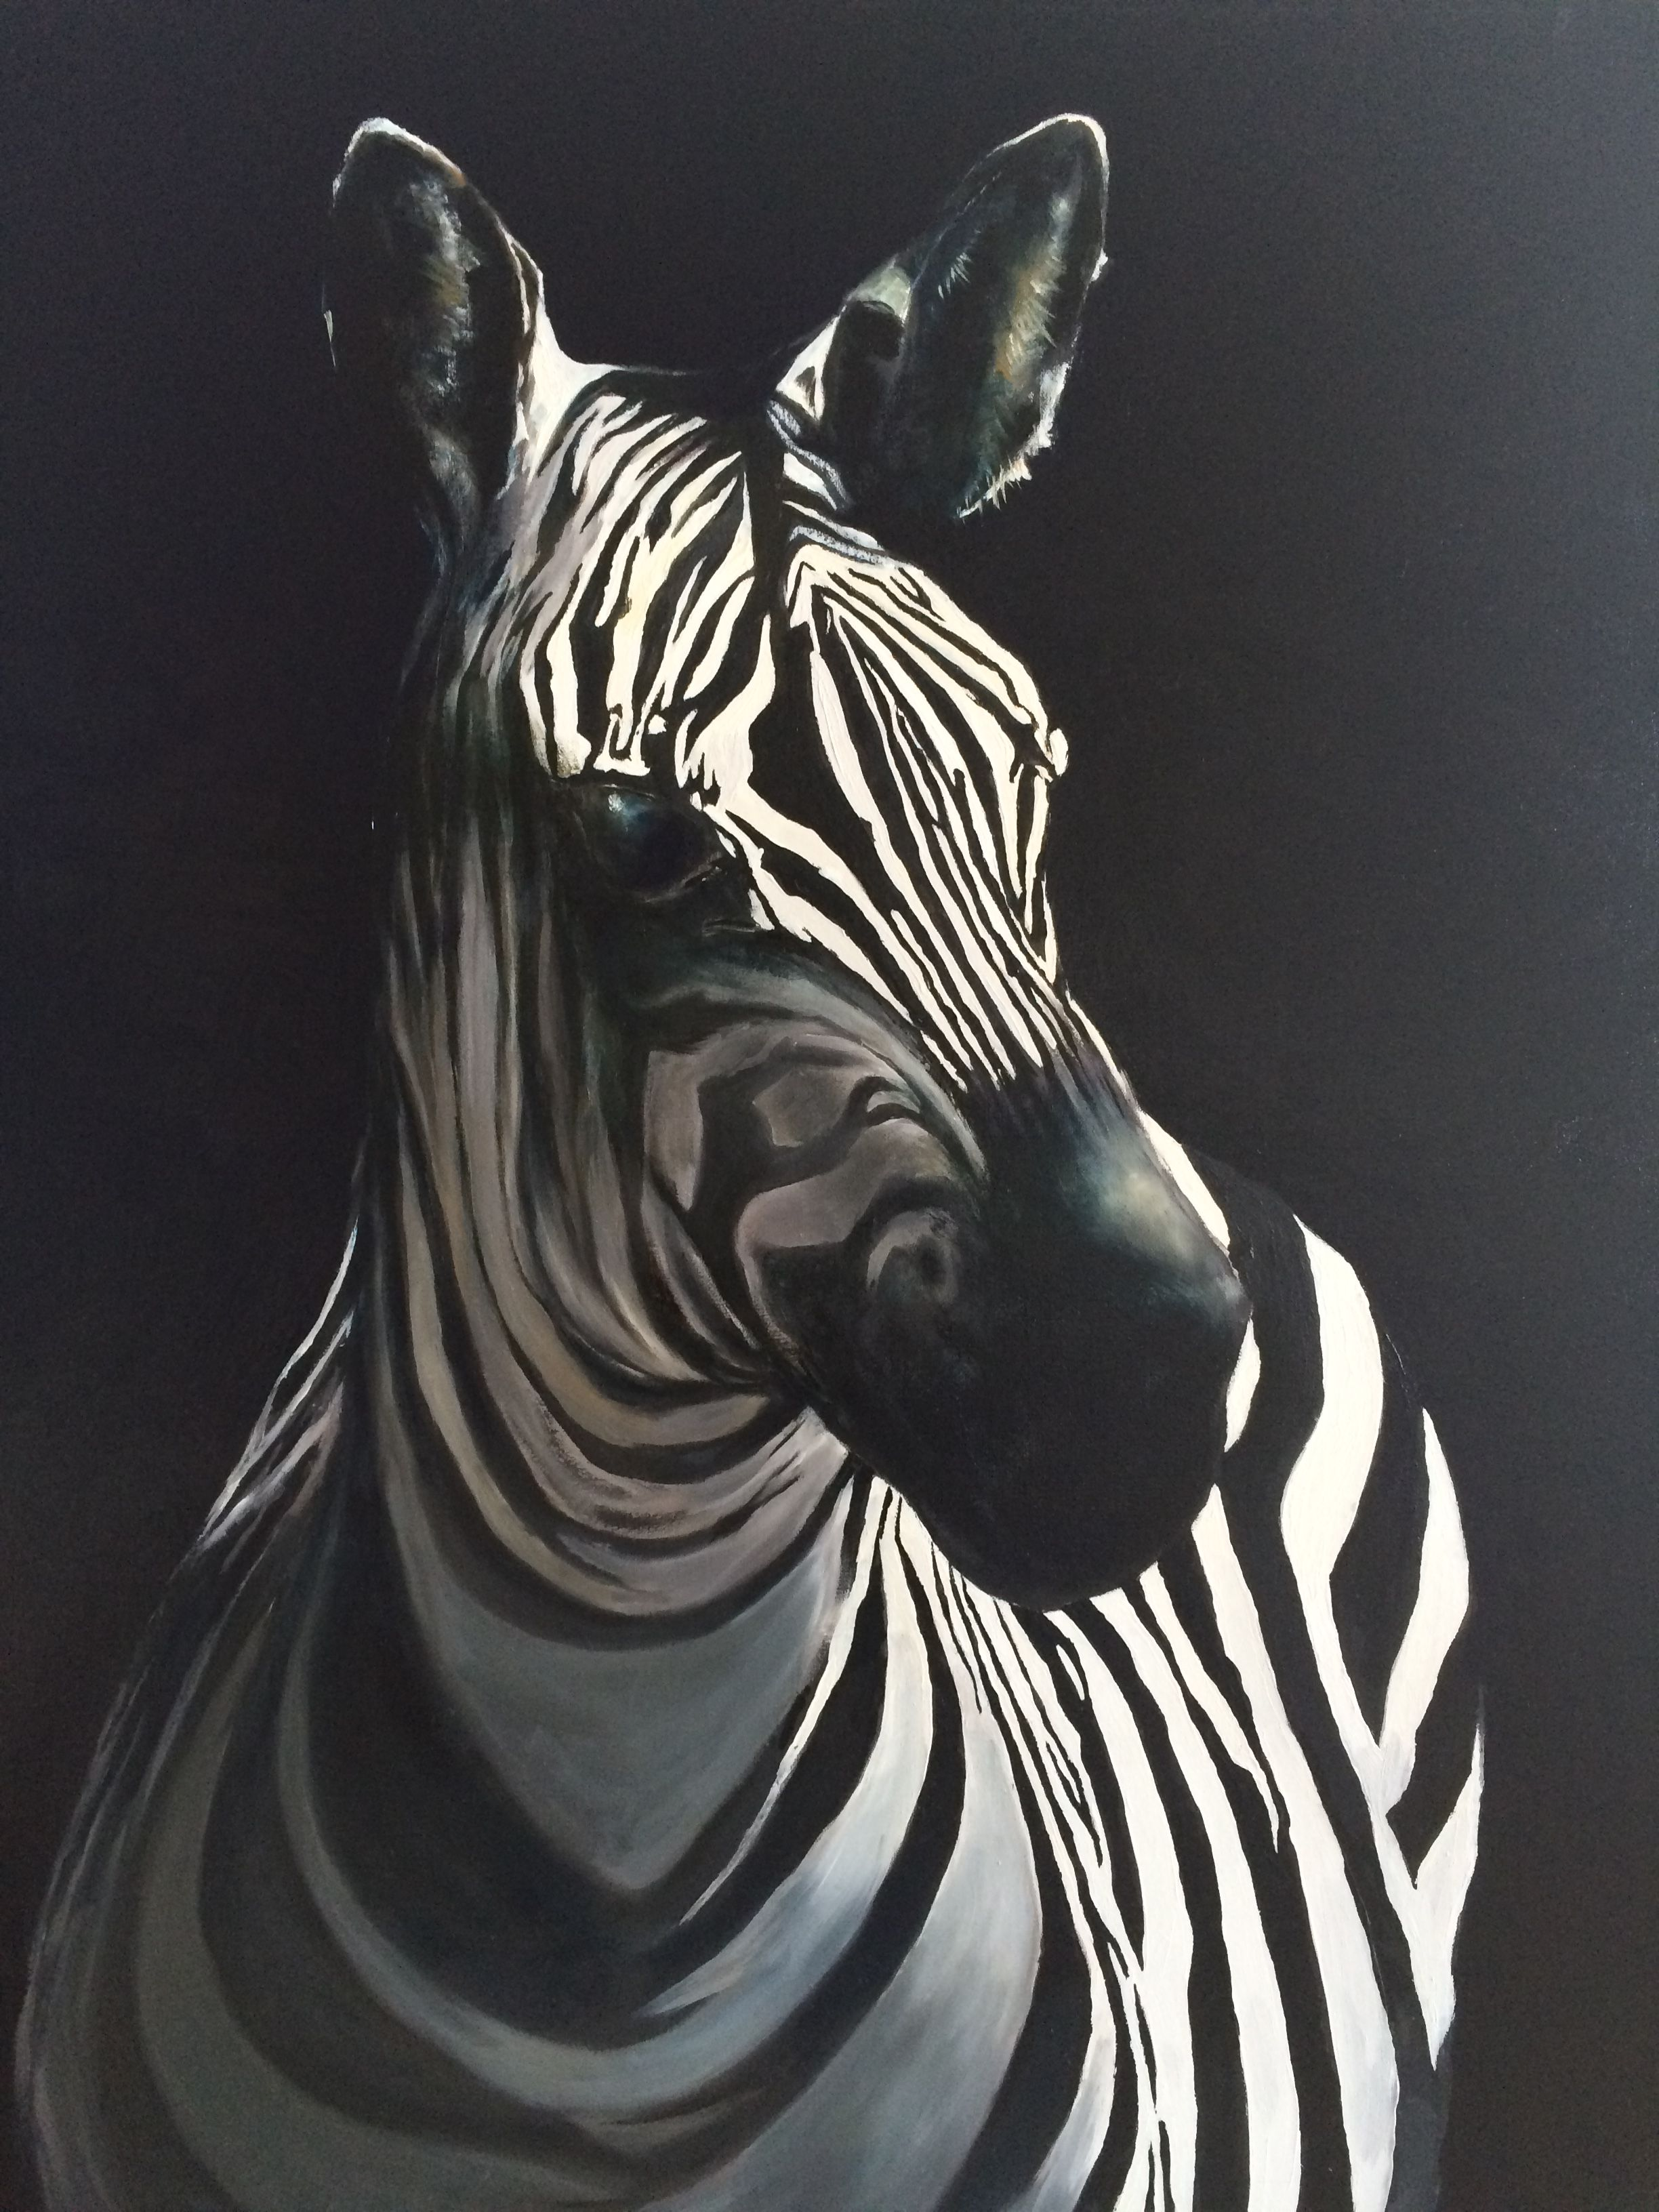 Zebra, Öl auf Leinwand, 80X40 cm Sonntagsarbeit, Malerei, Kunst, art work